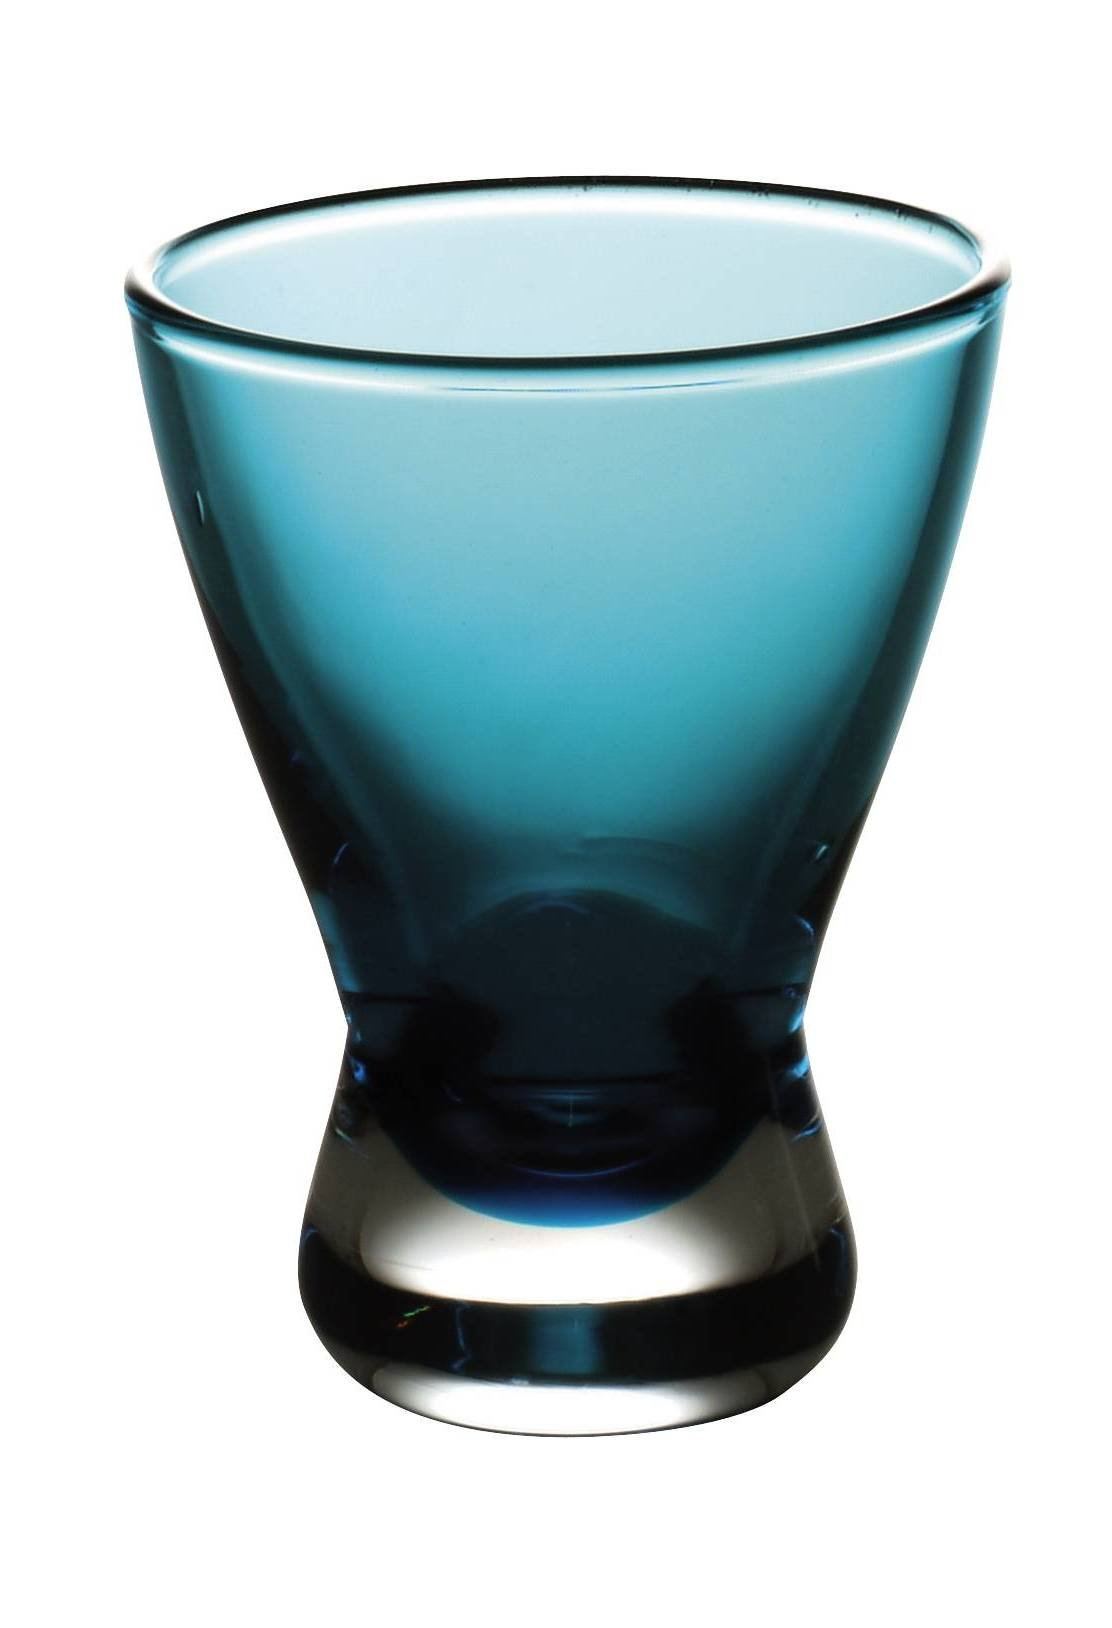 Barski - European Quality - Set of 6 - handmade - Liquor - Glass - Turquoise - 2 oz. - Made in Europe - Set of 6